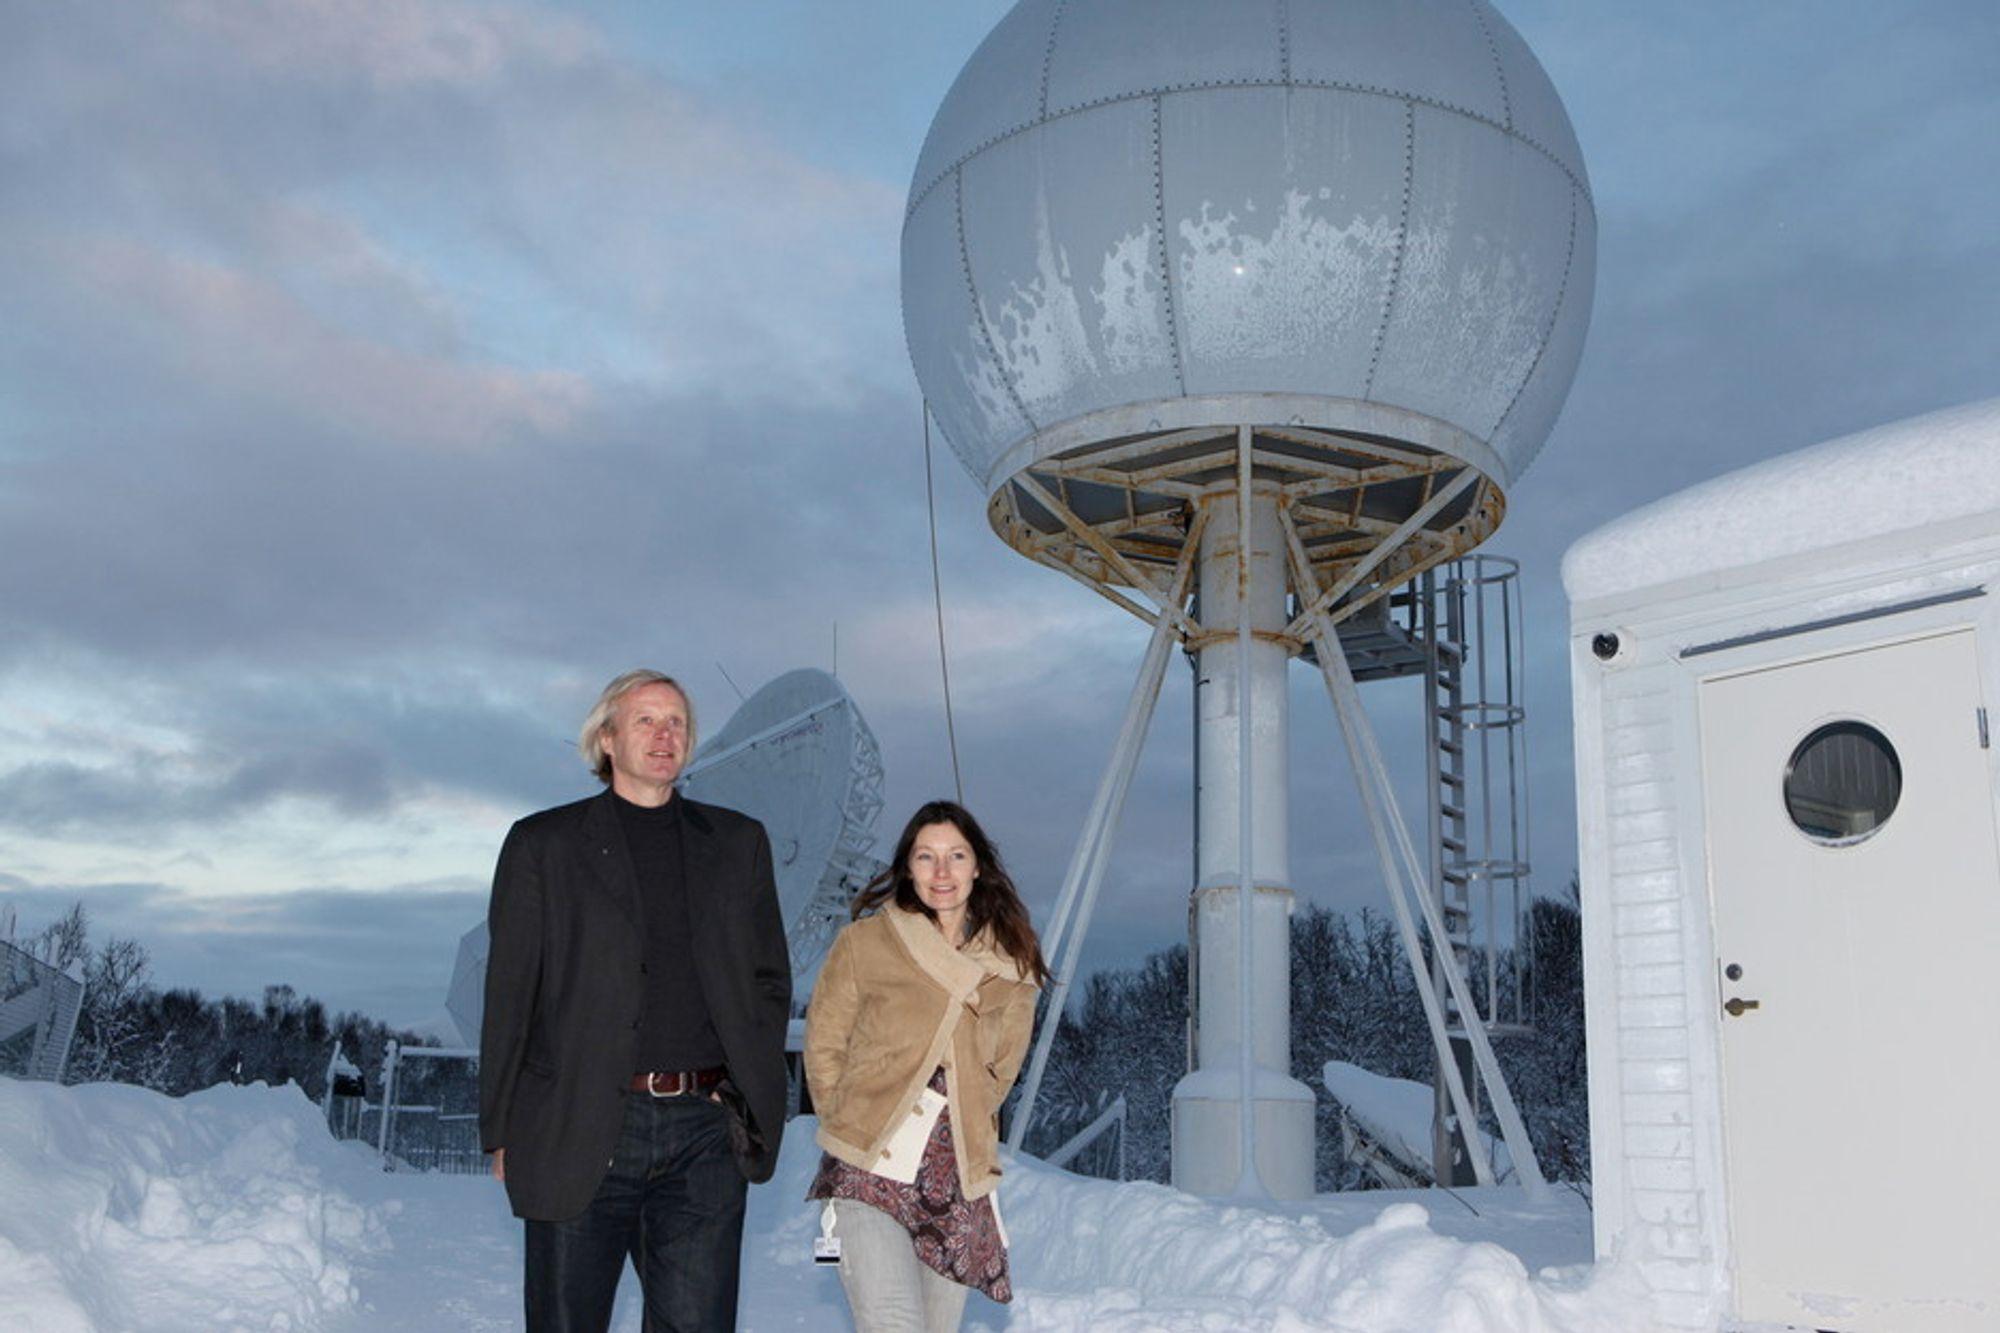 STORKONTRAKT: Adm. direktør Rolf Skattebø og markedssekretær Ellen Wiggen ved Kongsberg Satellite Services AS i Tromsø er glad for storkontrakten med USA-firmaet Digital Globe om levering av satellittdata.